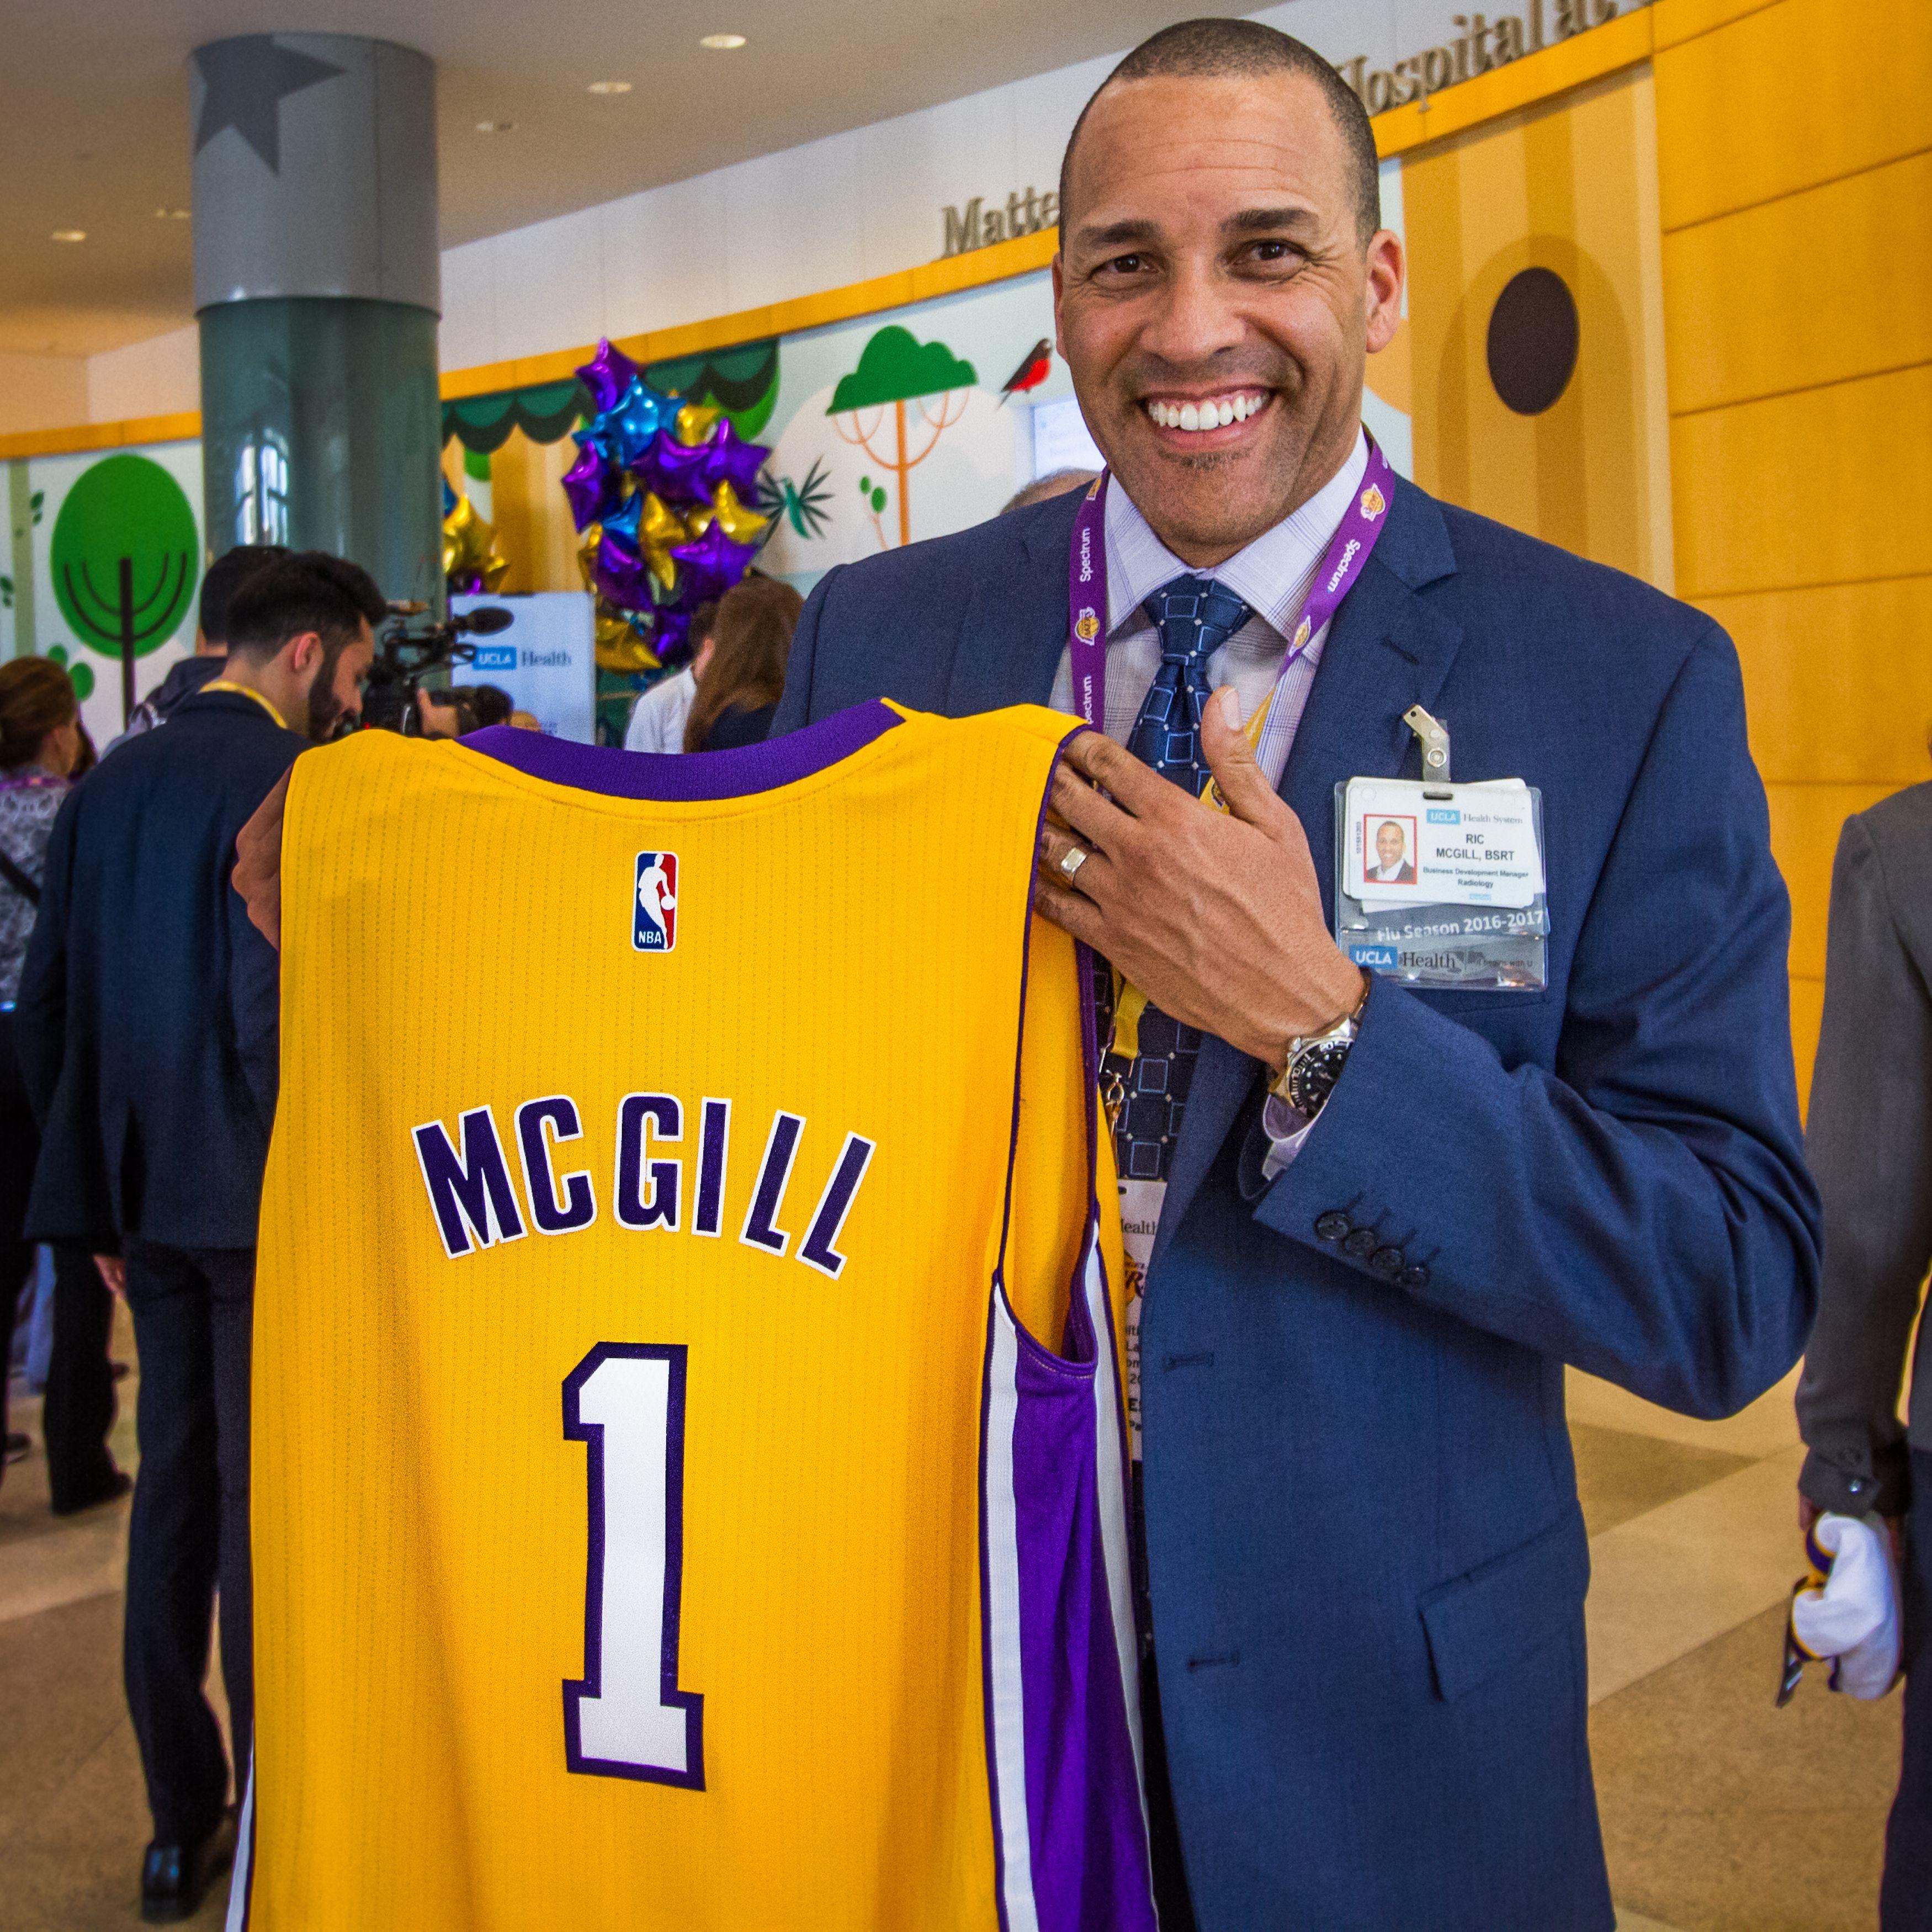 Partnership Ucla: Pin On UCLA Health And Lakers